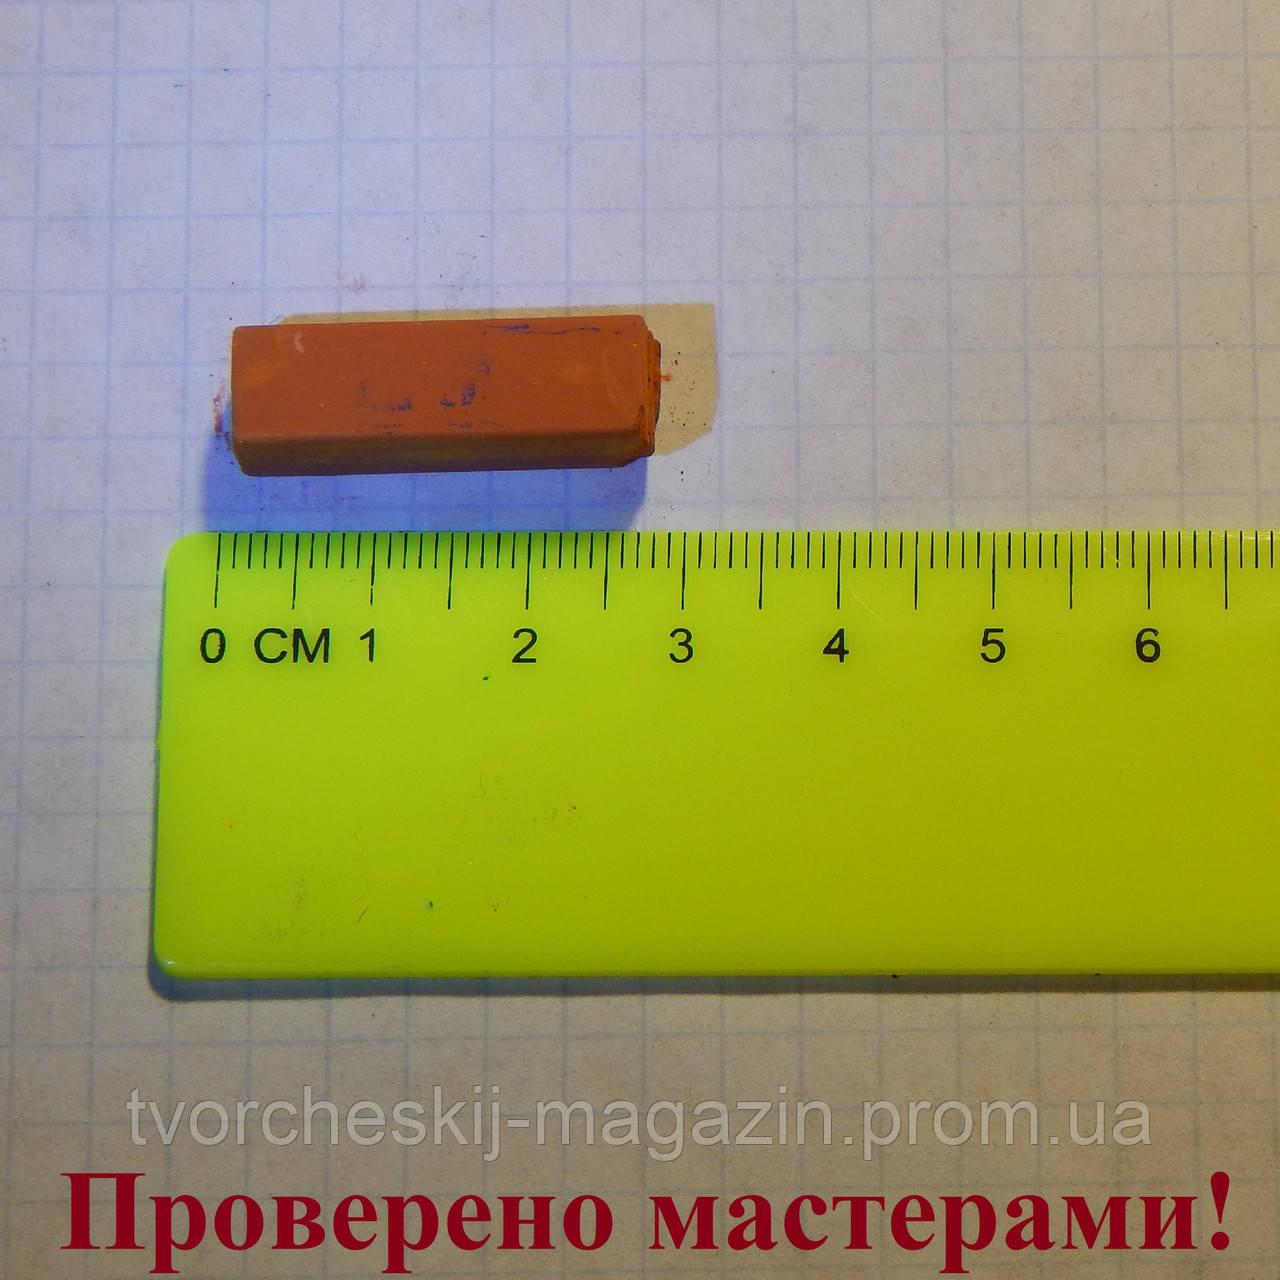 Пастель сухая мягкая MUNGYO 1/2 охра жженая